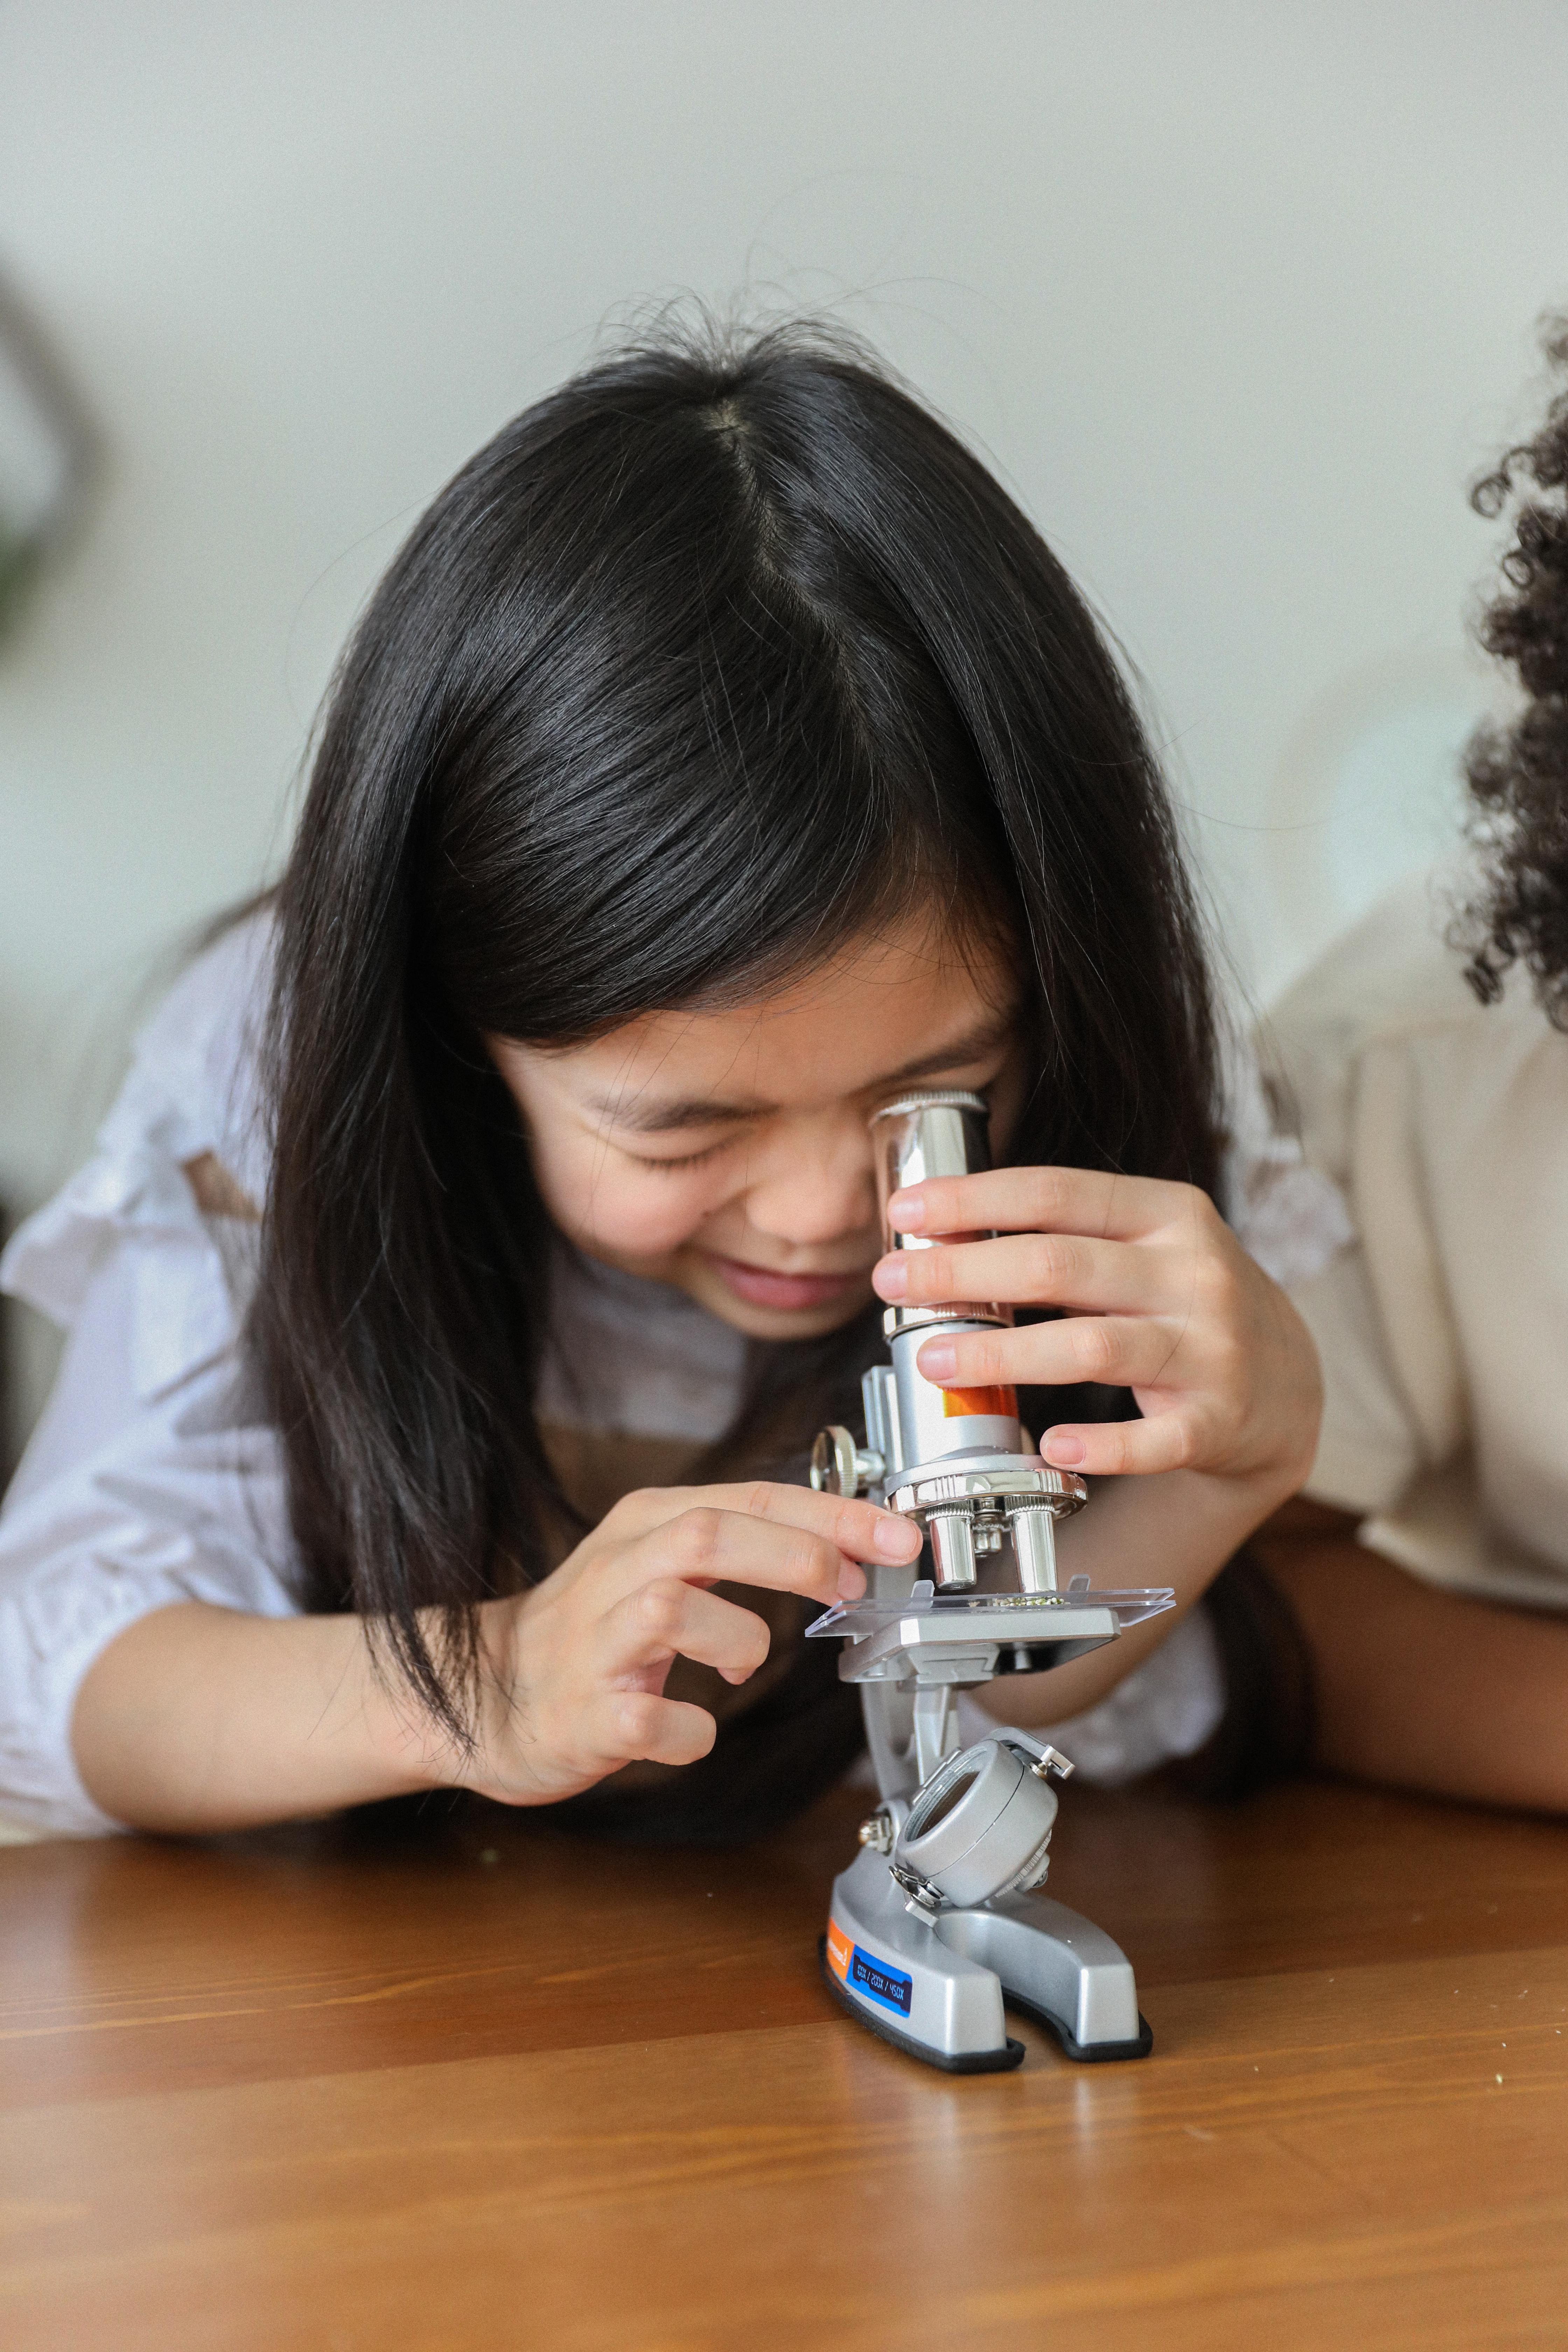 curious ethnic child examining chemical instruments in studio